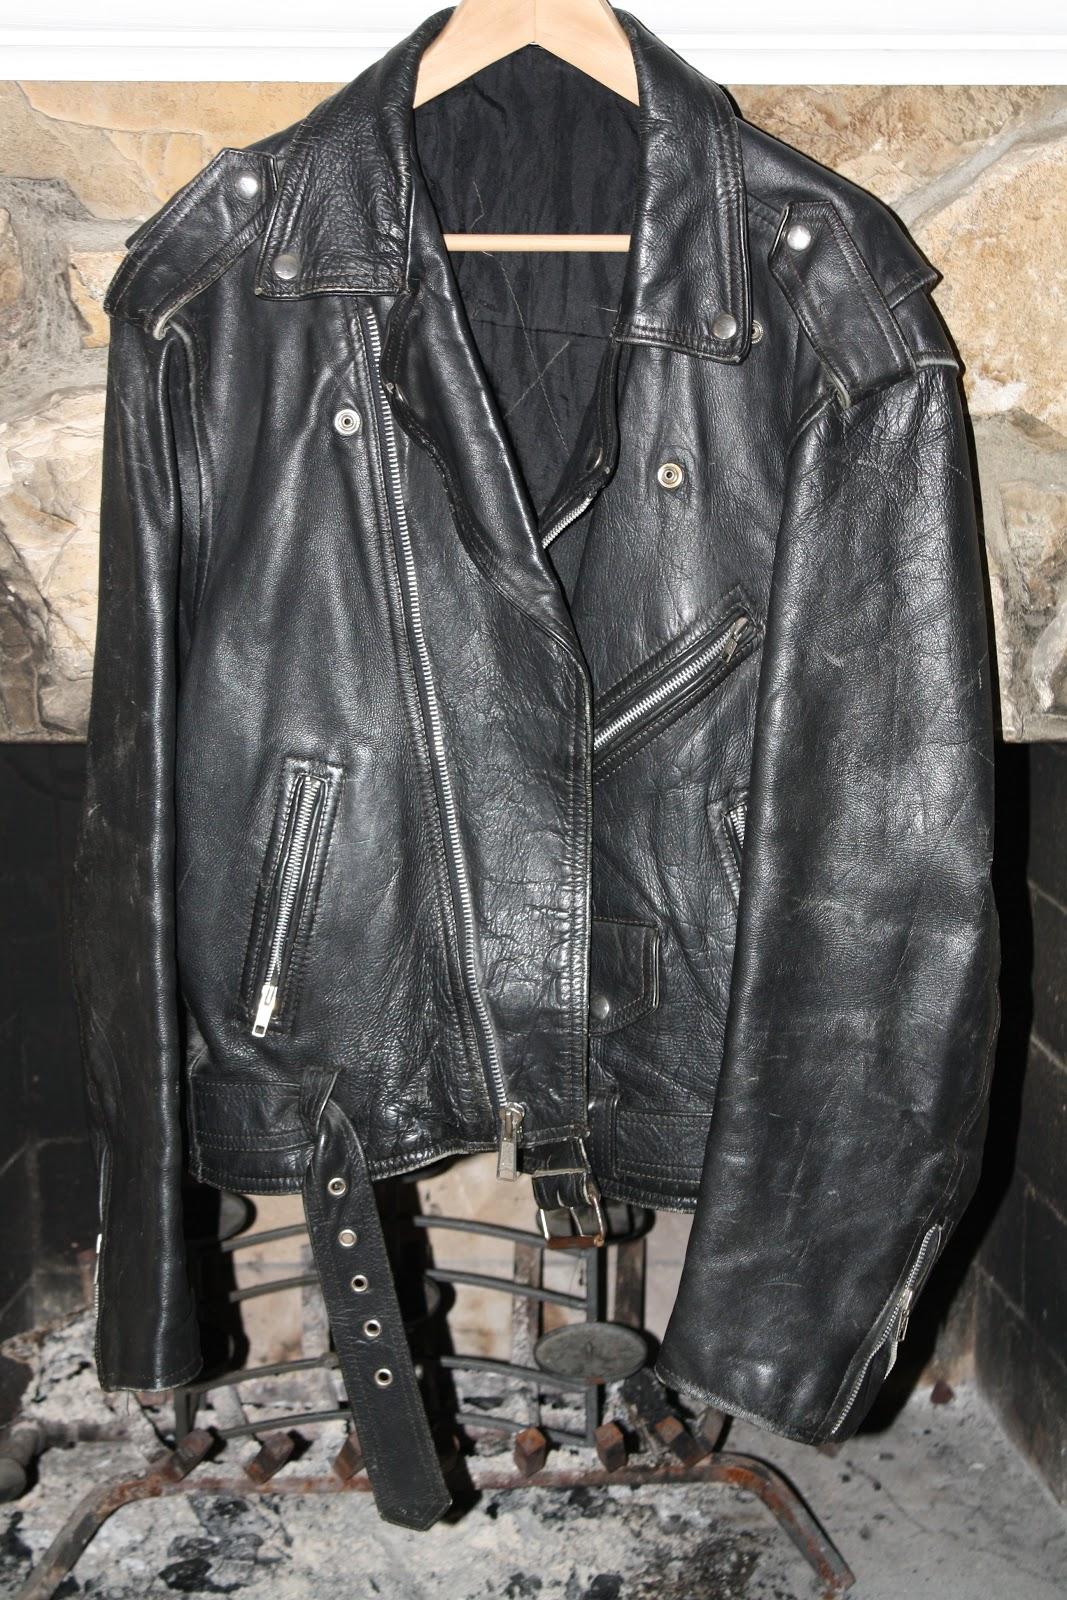 Vintage And Old School Vintage Work Boots Jackets